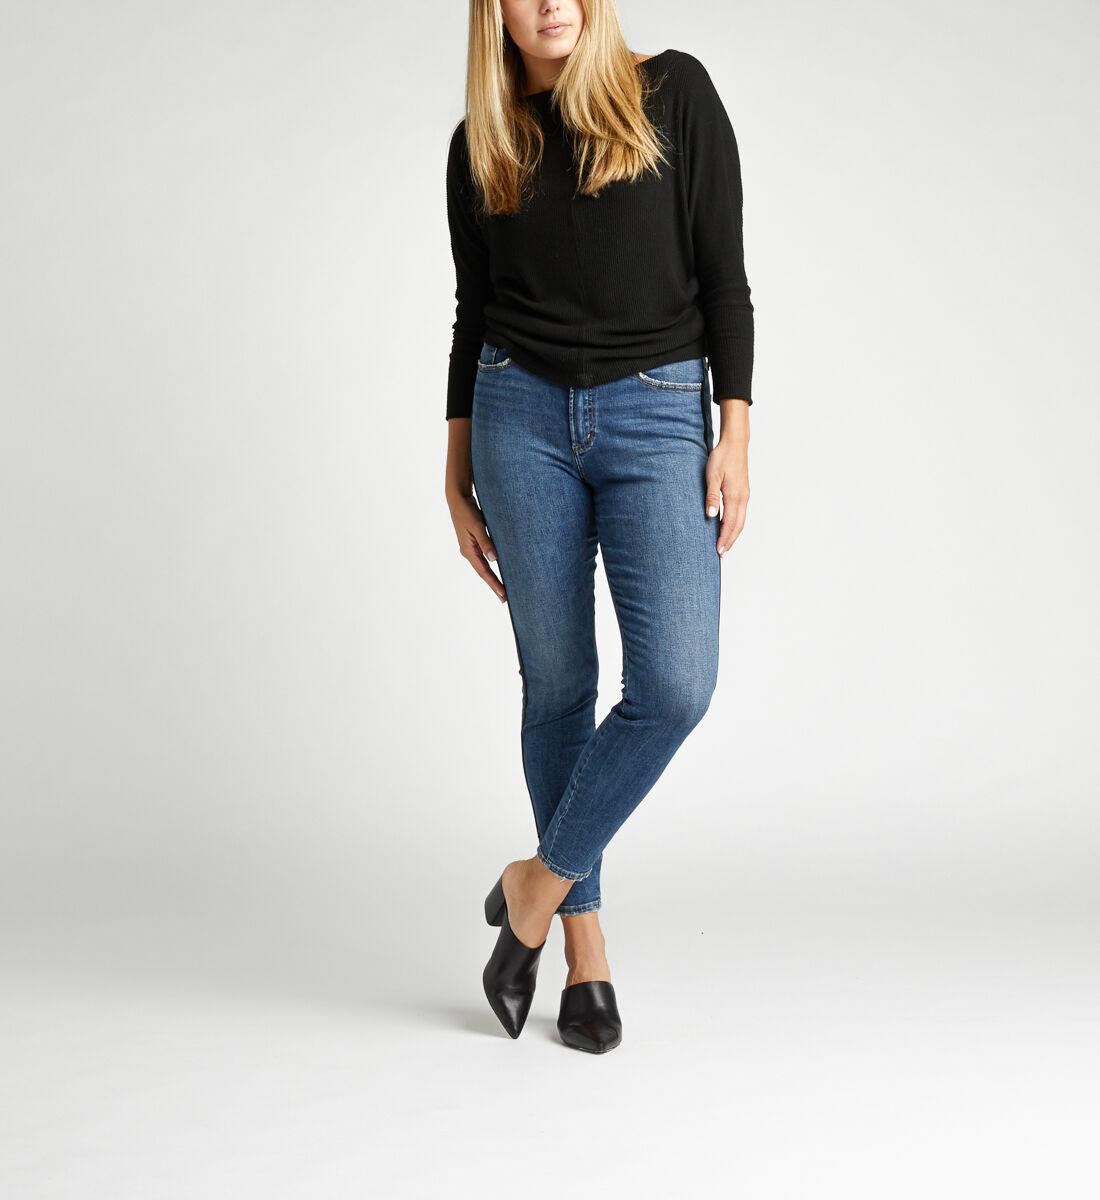 Calley Super High Rise Skinny Jeans Alt Image 1